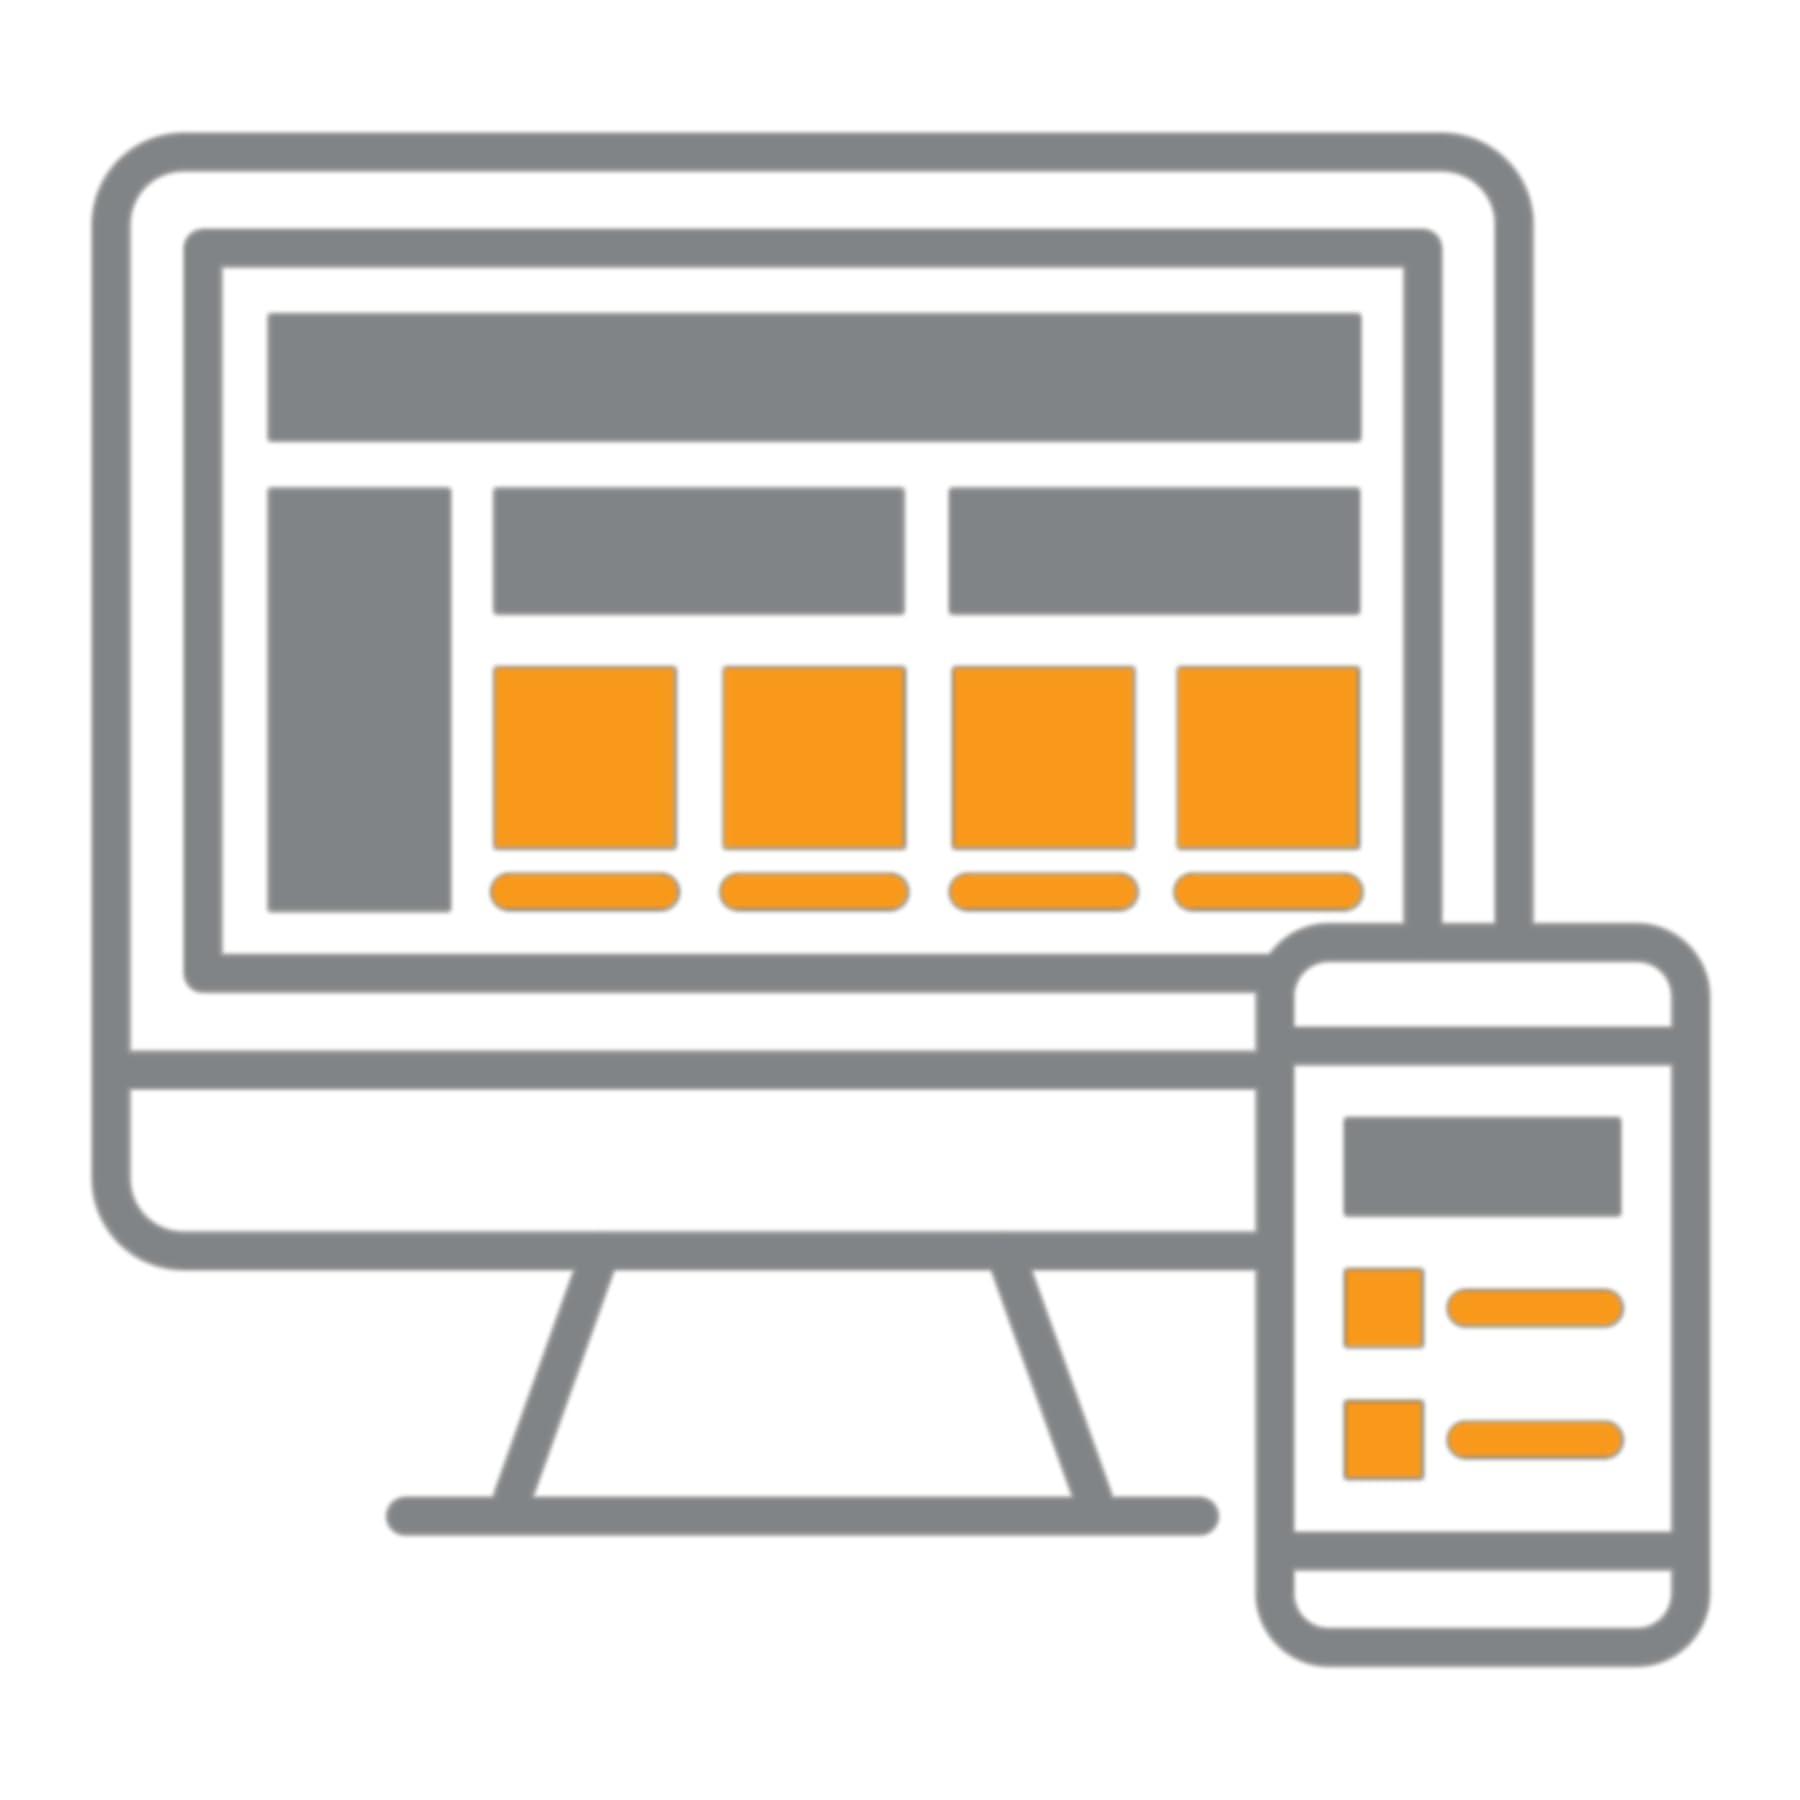 "{""blocks"":[{""key"":""6l66p"",""text"":""Placement degli annunci Sponsored Products su desktop e dispositivi mobili"",""type"":""unstyled"",""depth"":0,""inlineStyleRanges"":[],""entityRanges"":[],""data"":{}}],""entityMap"":{}}"